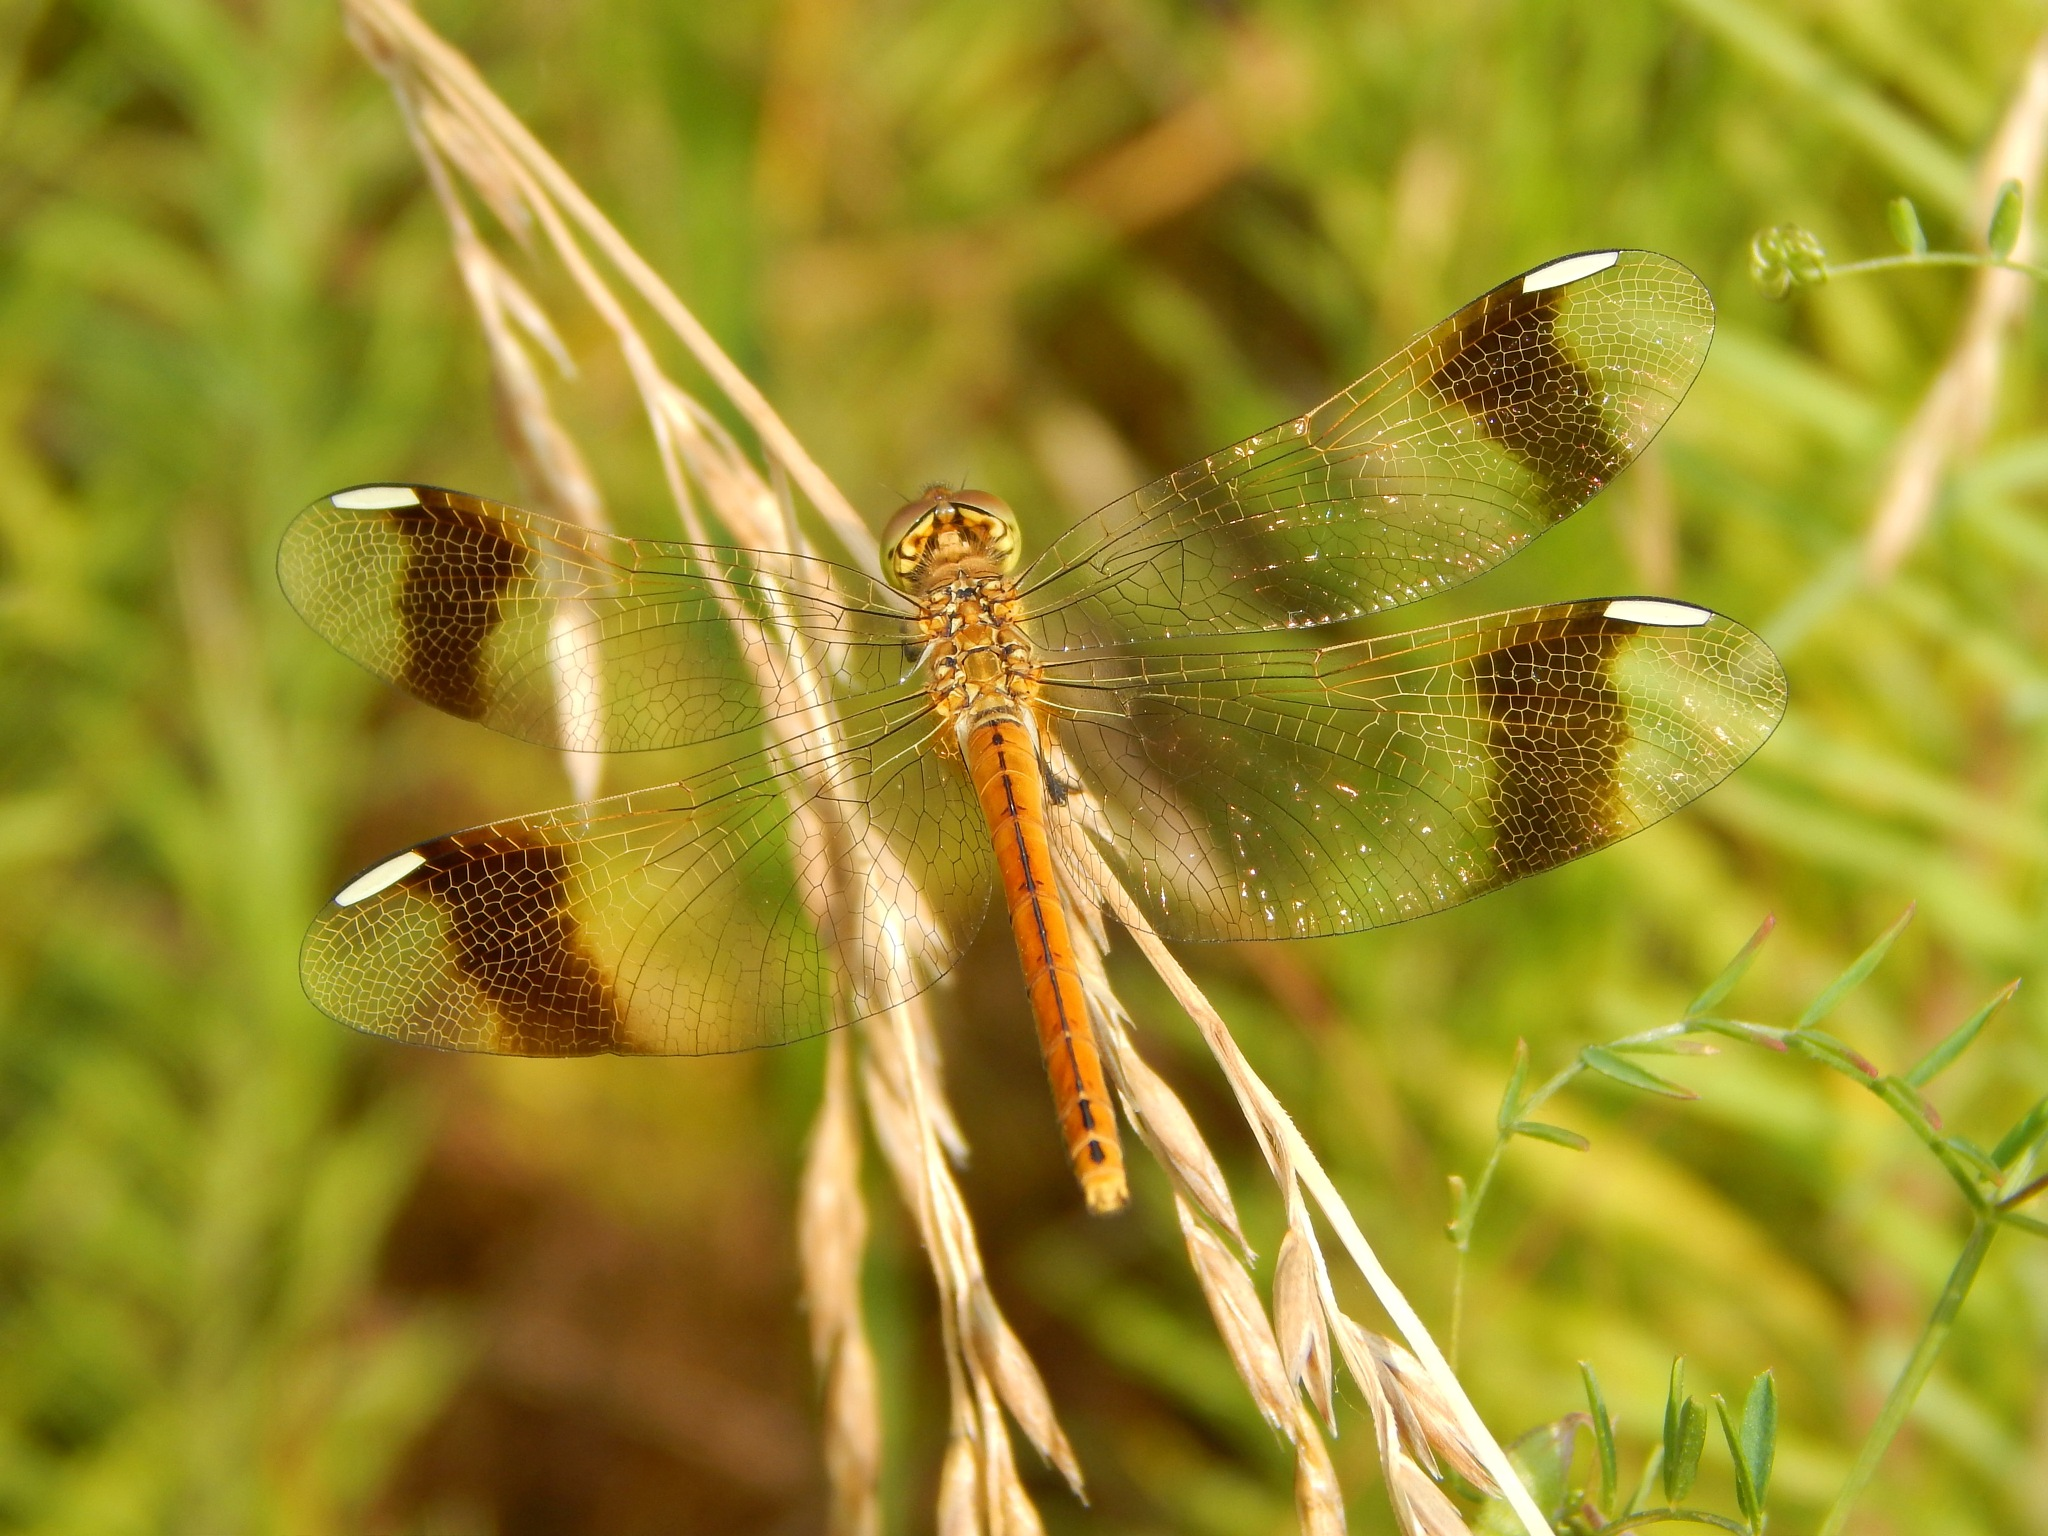 Dragonfly by robertamastretta